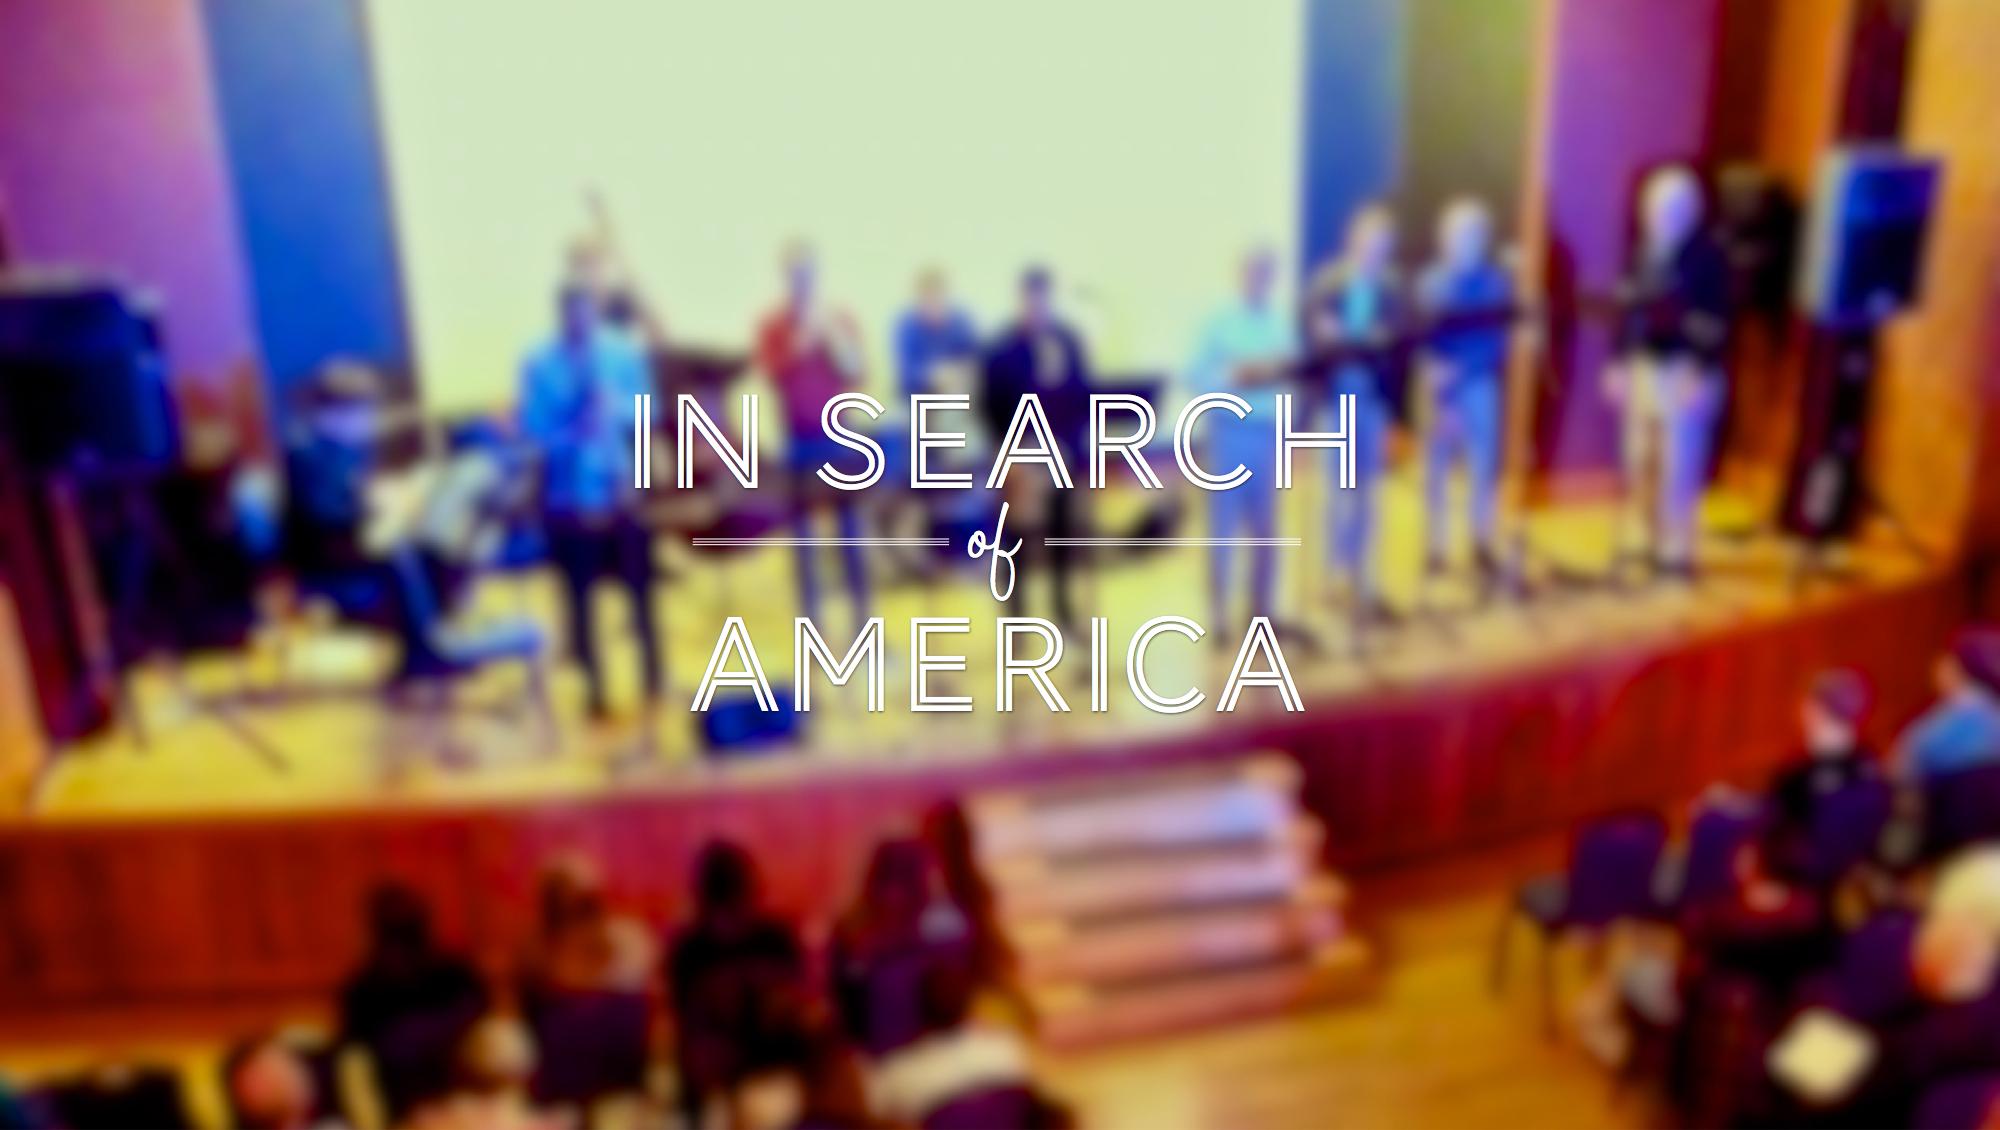 in search america.jpg